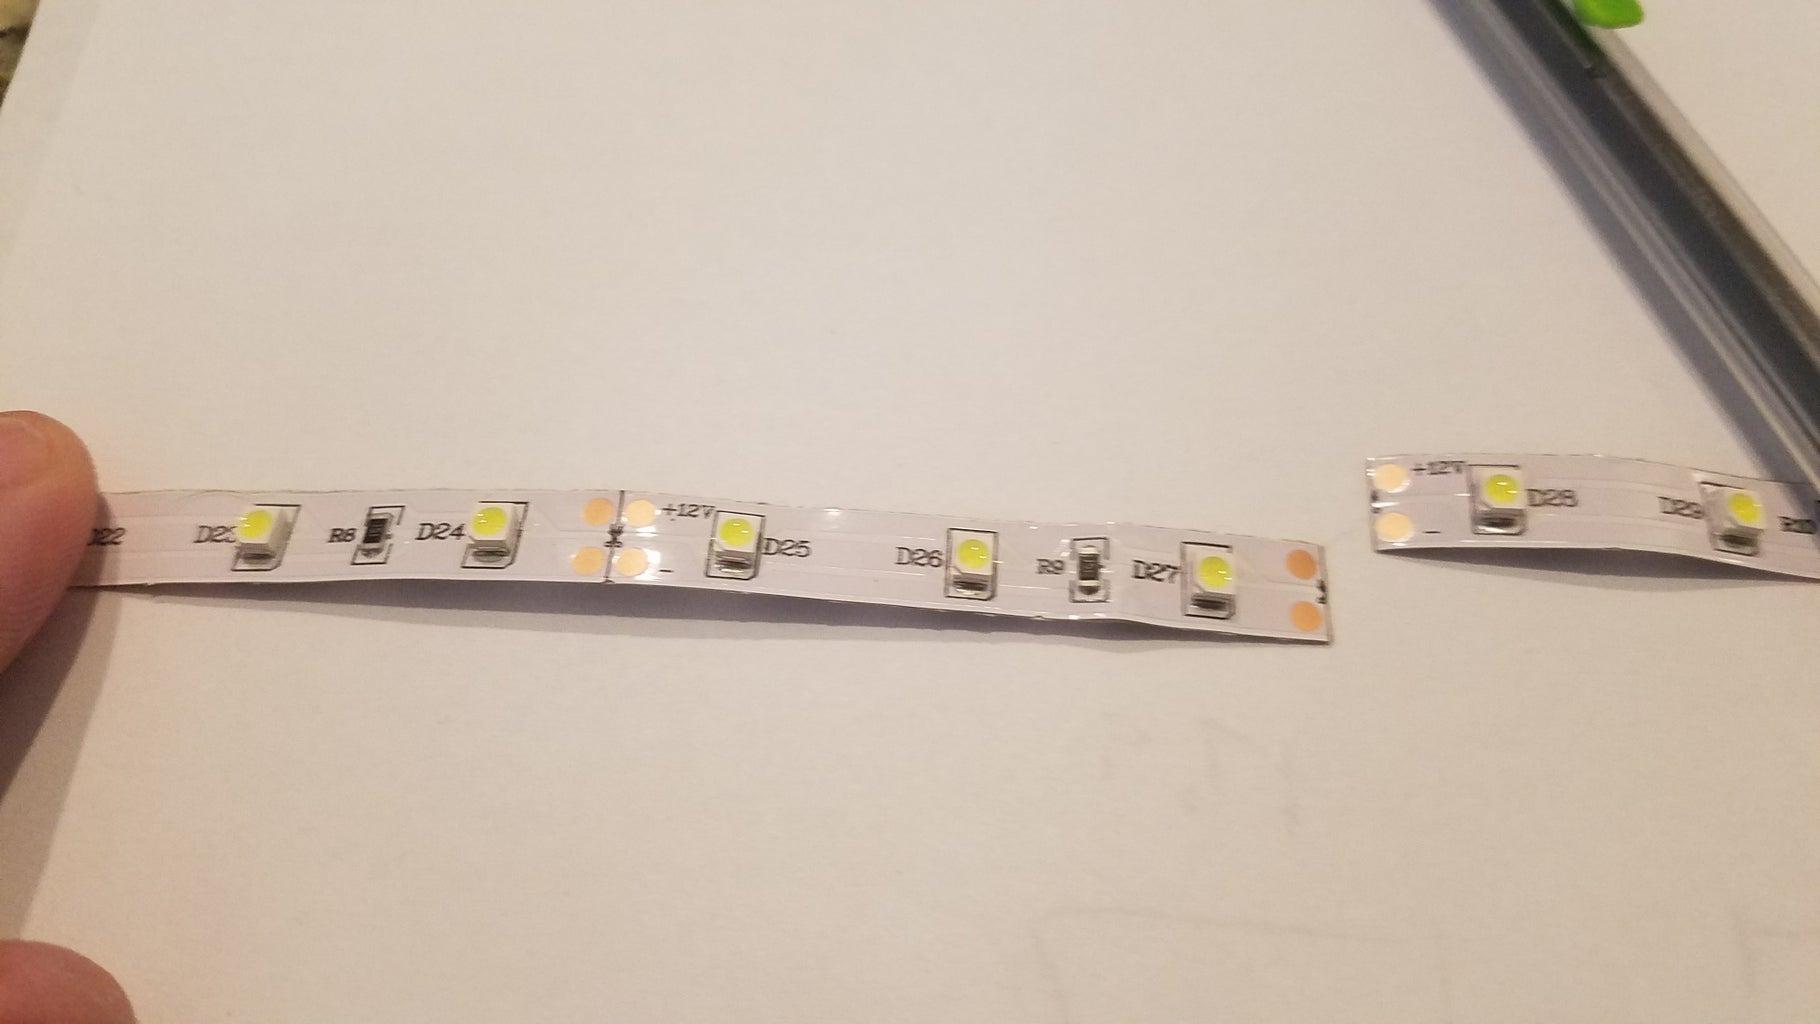 LED Light Strips - Tool Chest So Bright I Gotta Wear Shades